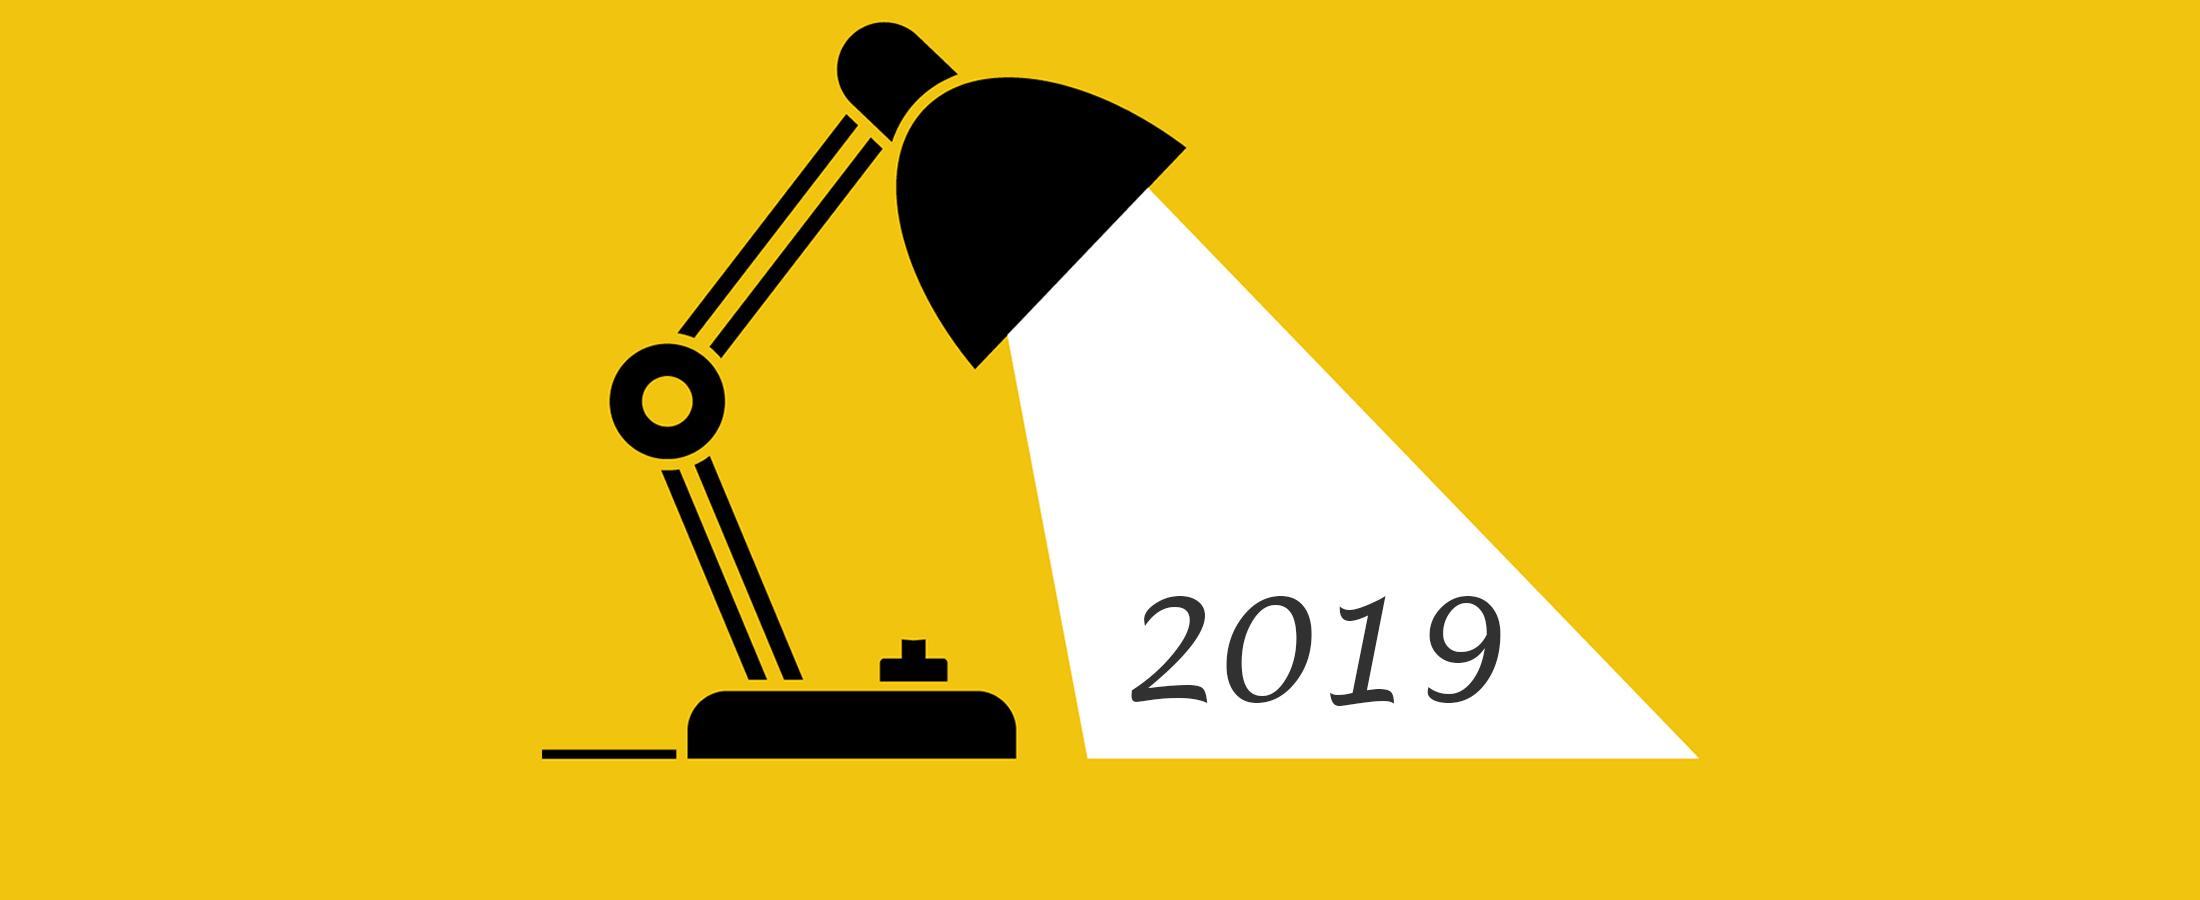 New Years Greetings 2019